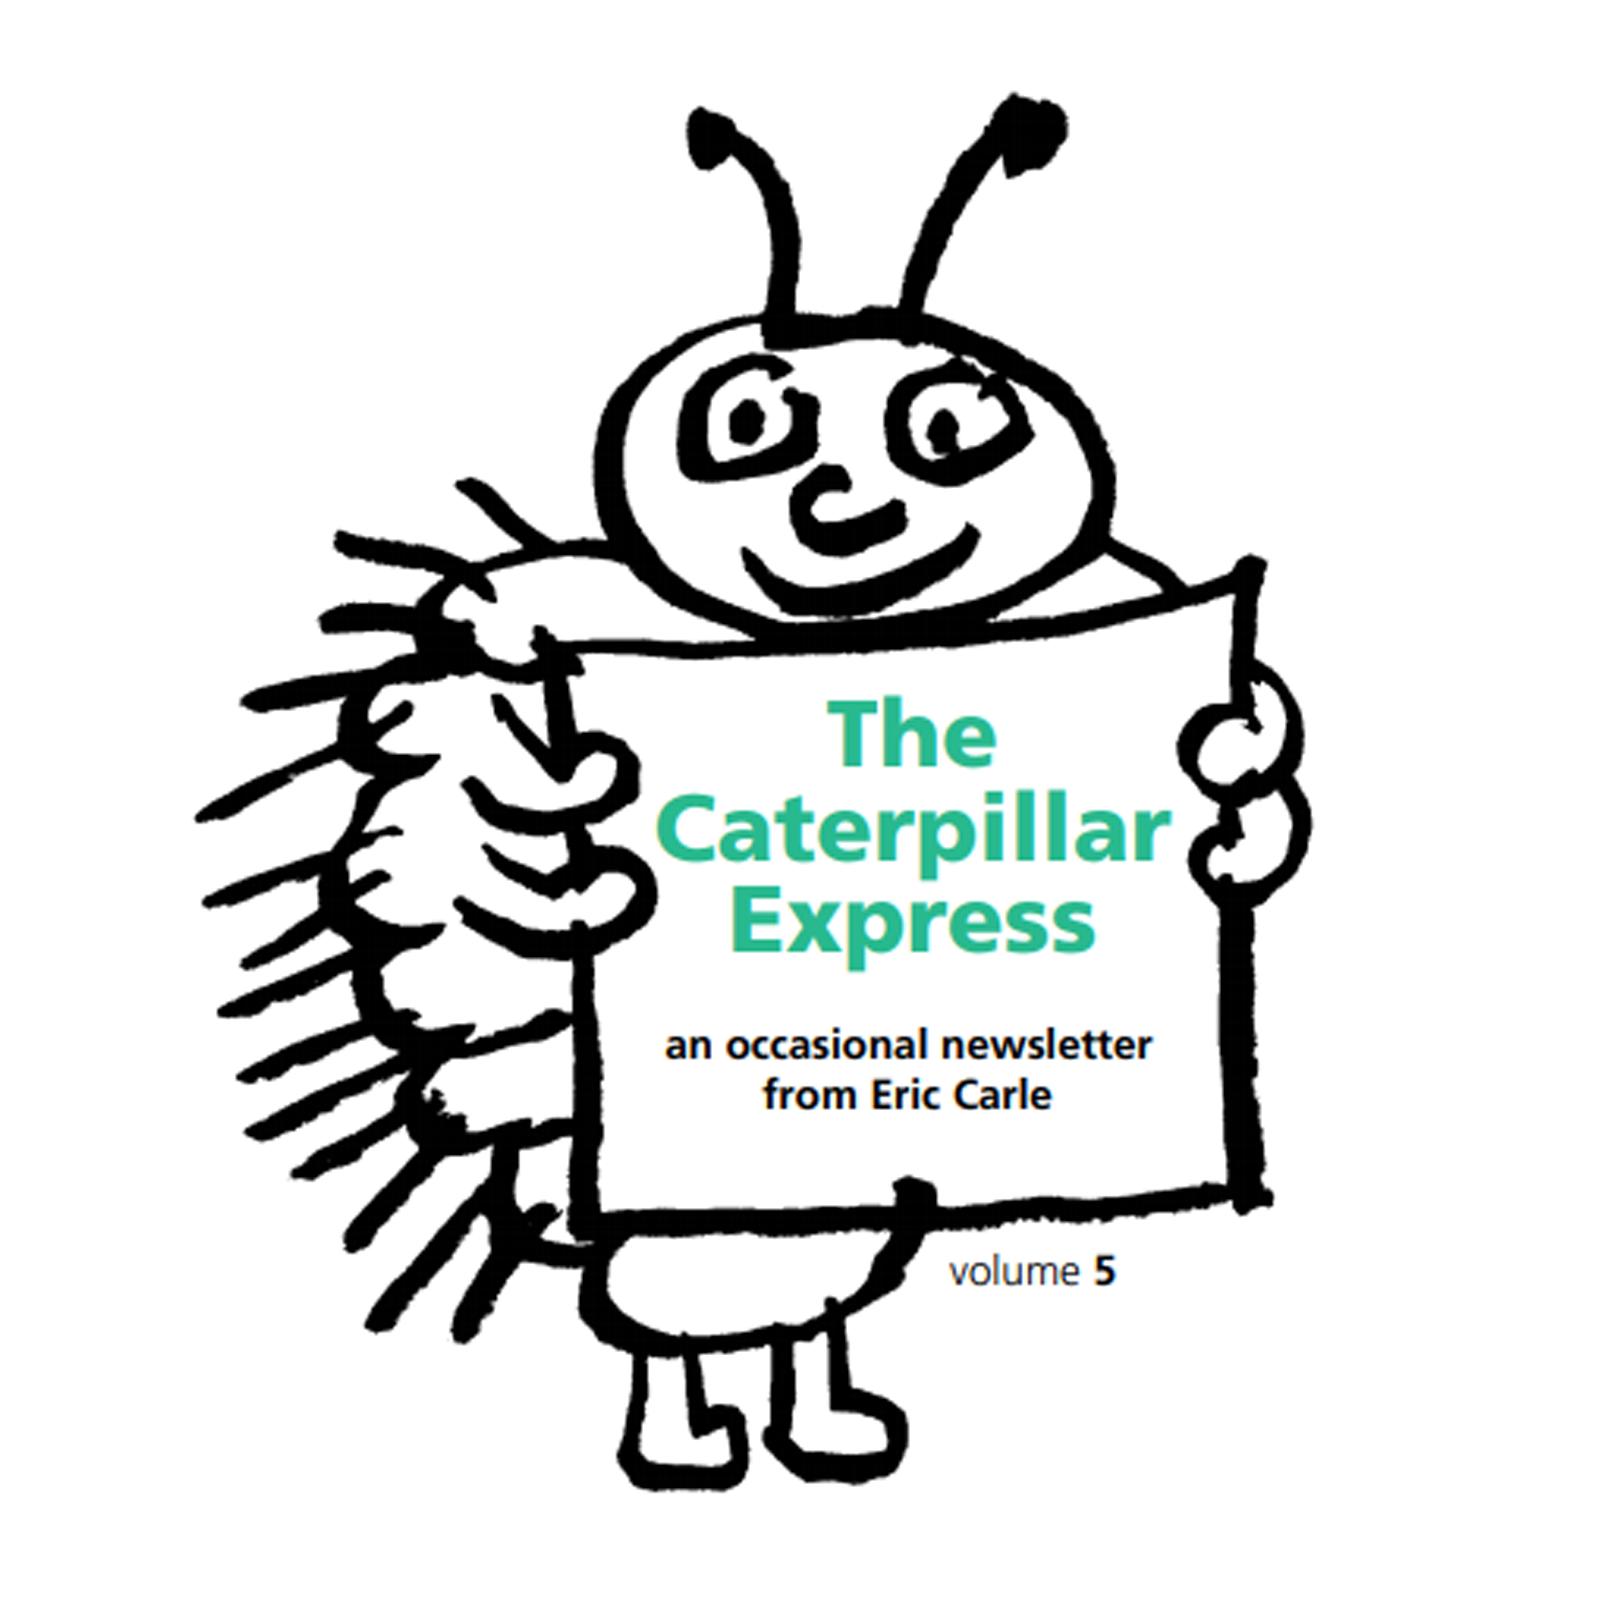 Caterpillar Express Volume 5